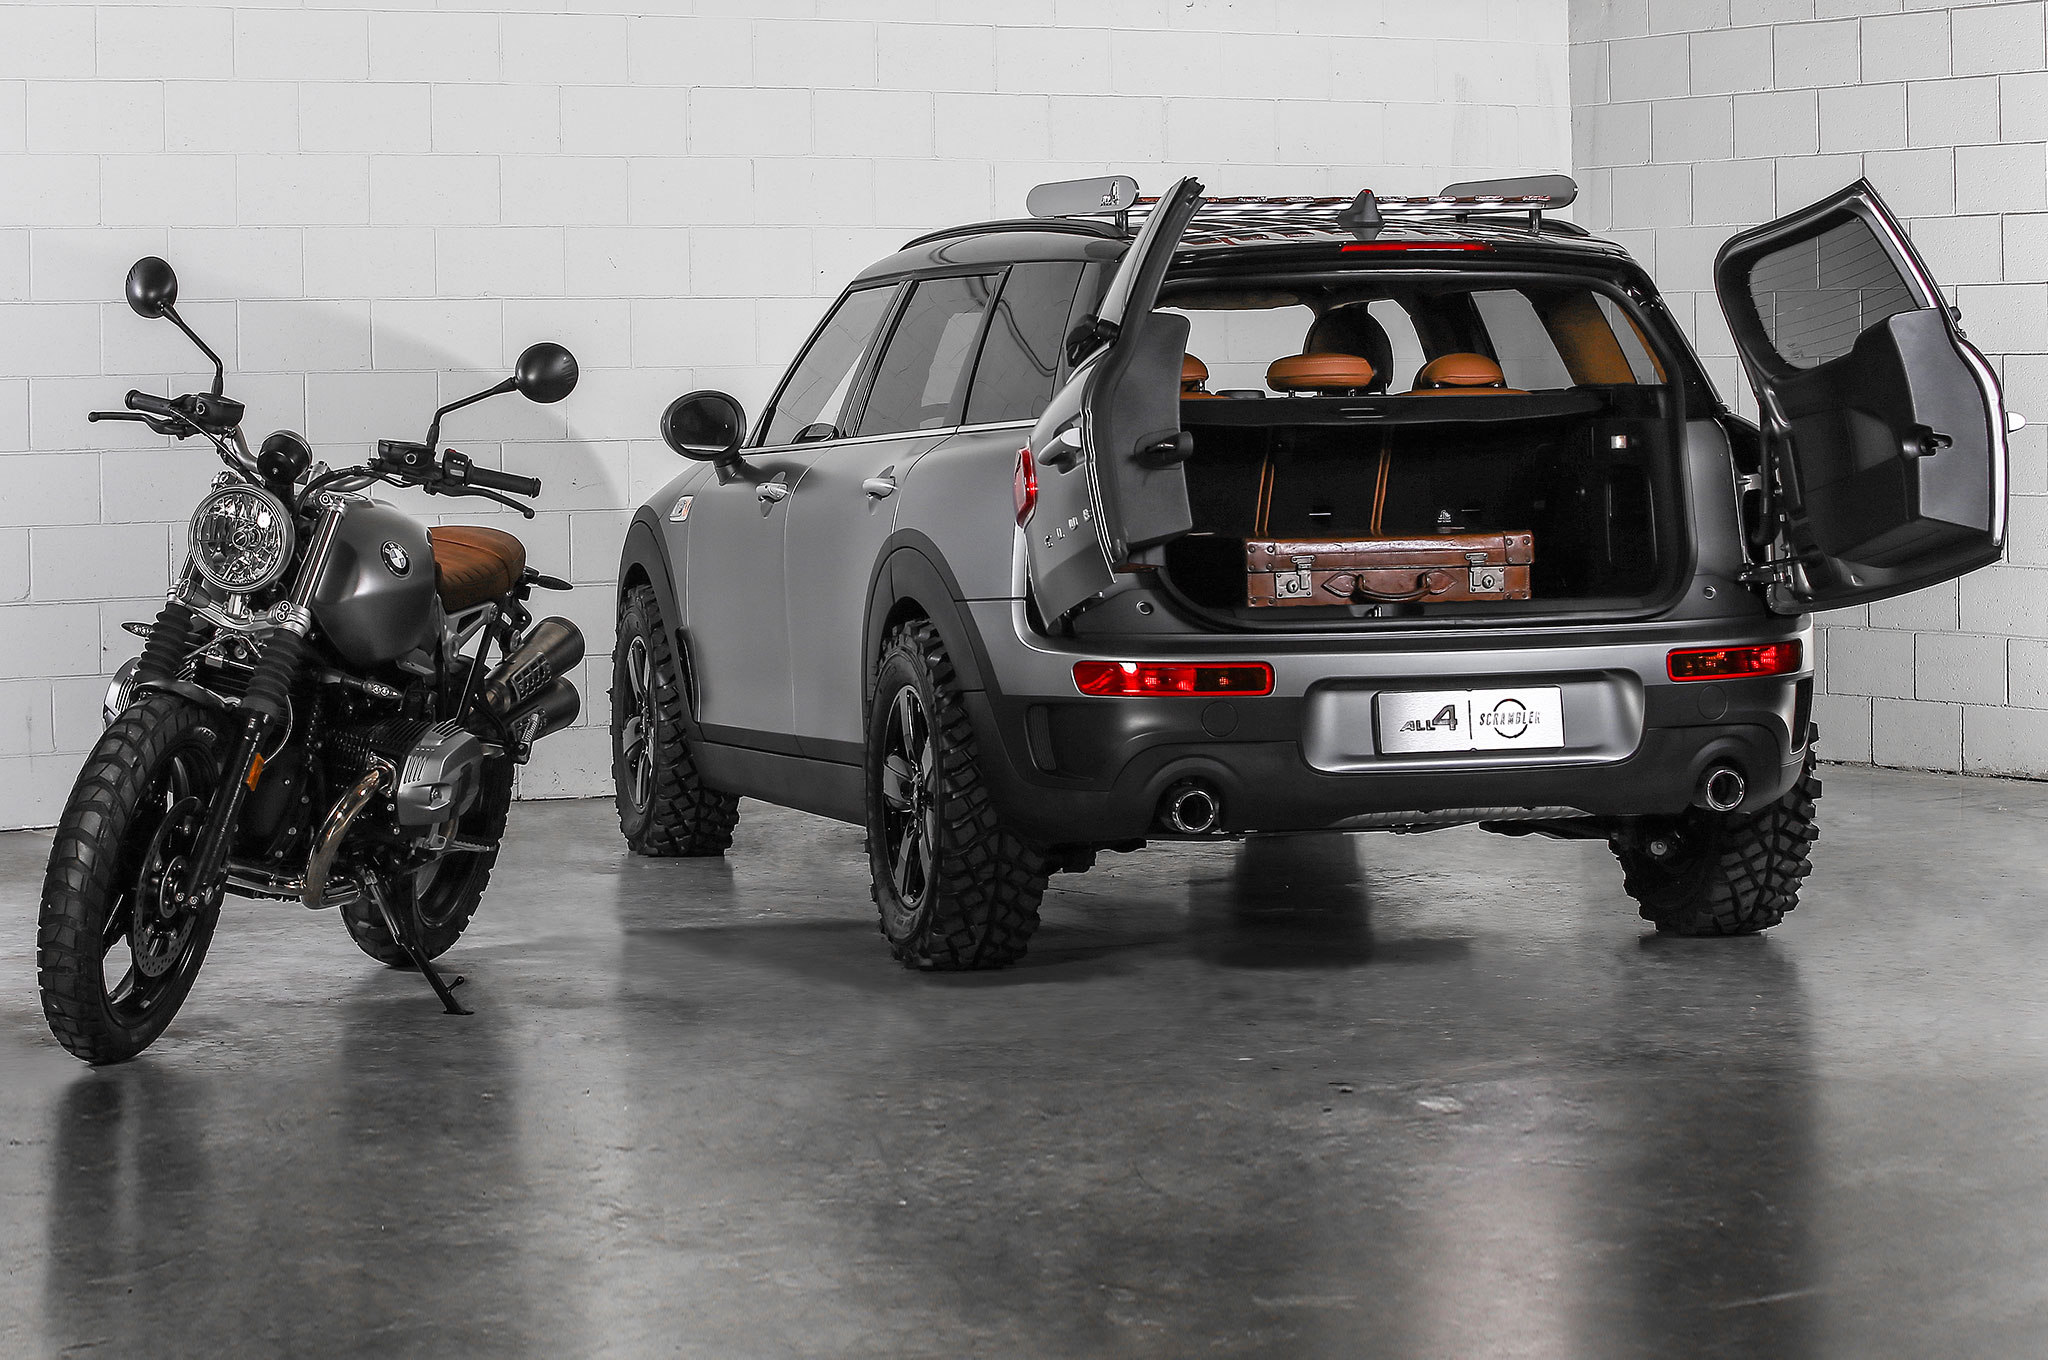 Mini Clubman ALL4 Scrambler concept rear view with bike